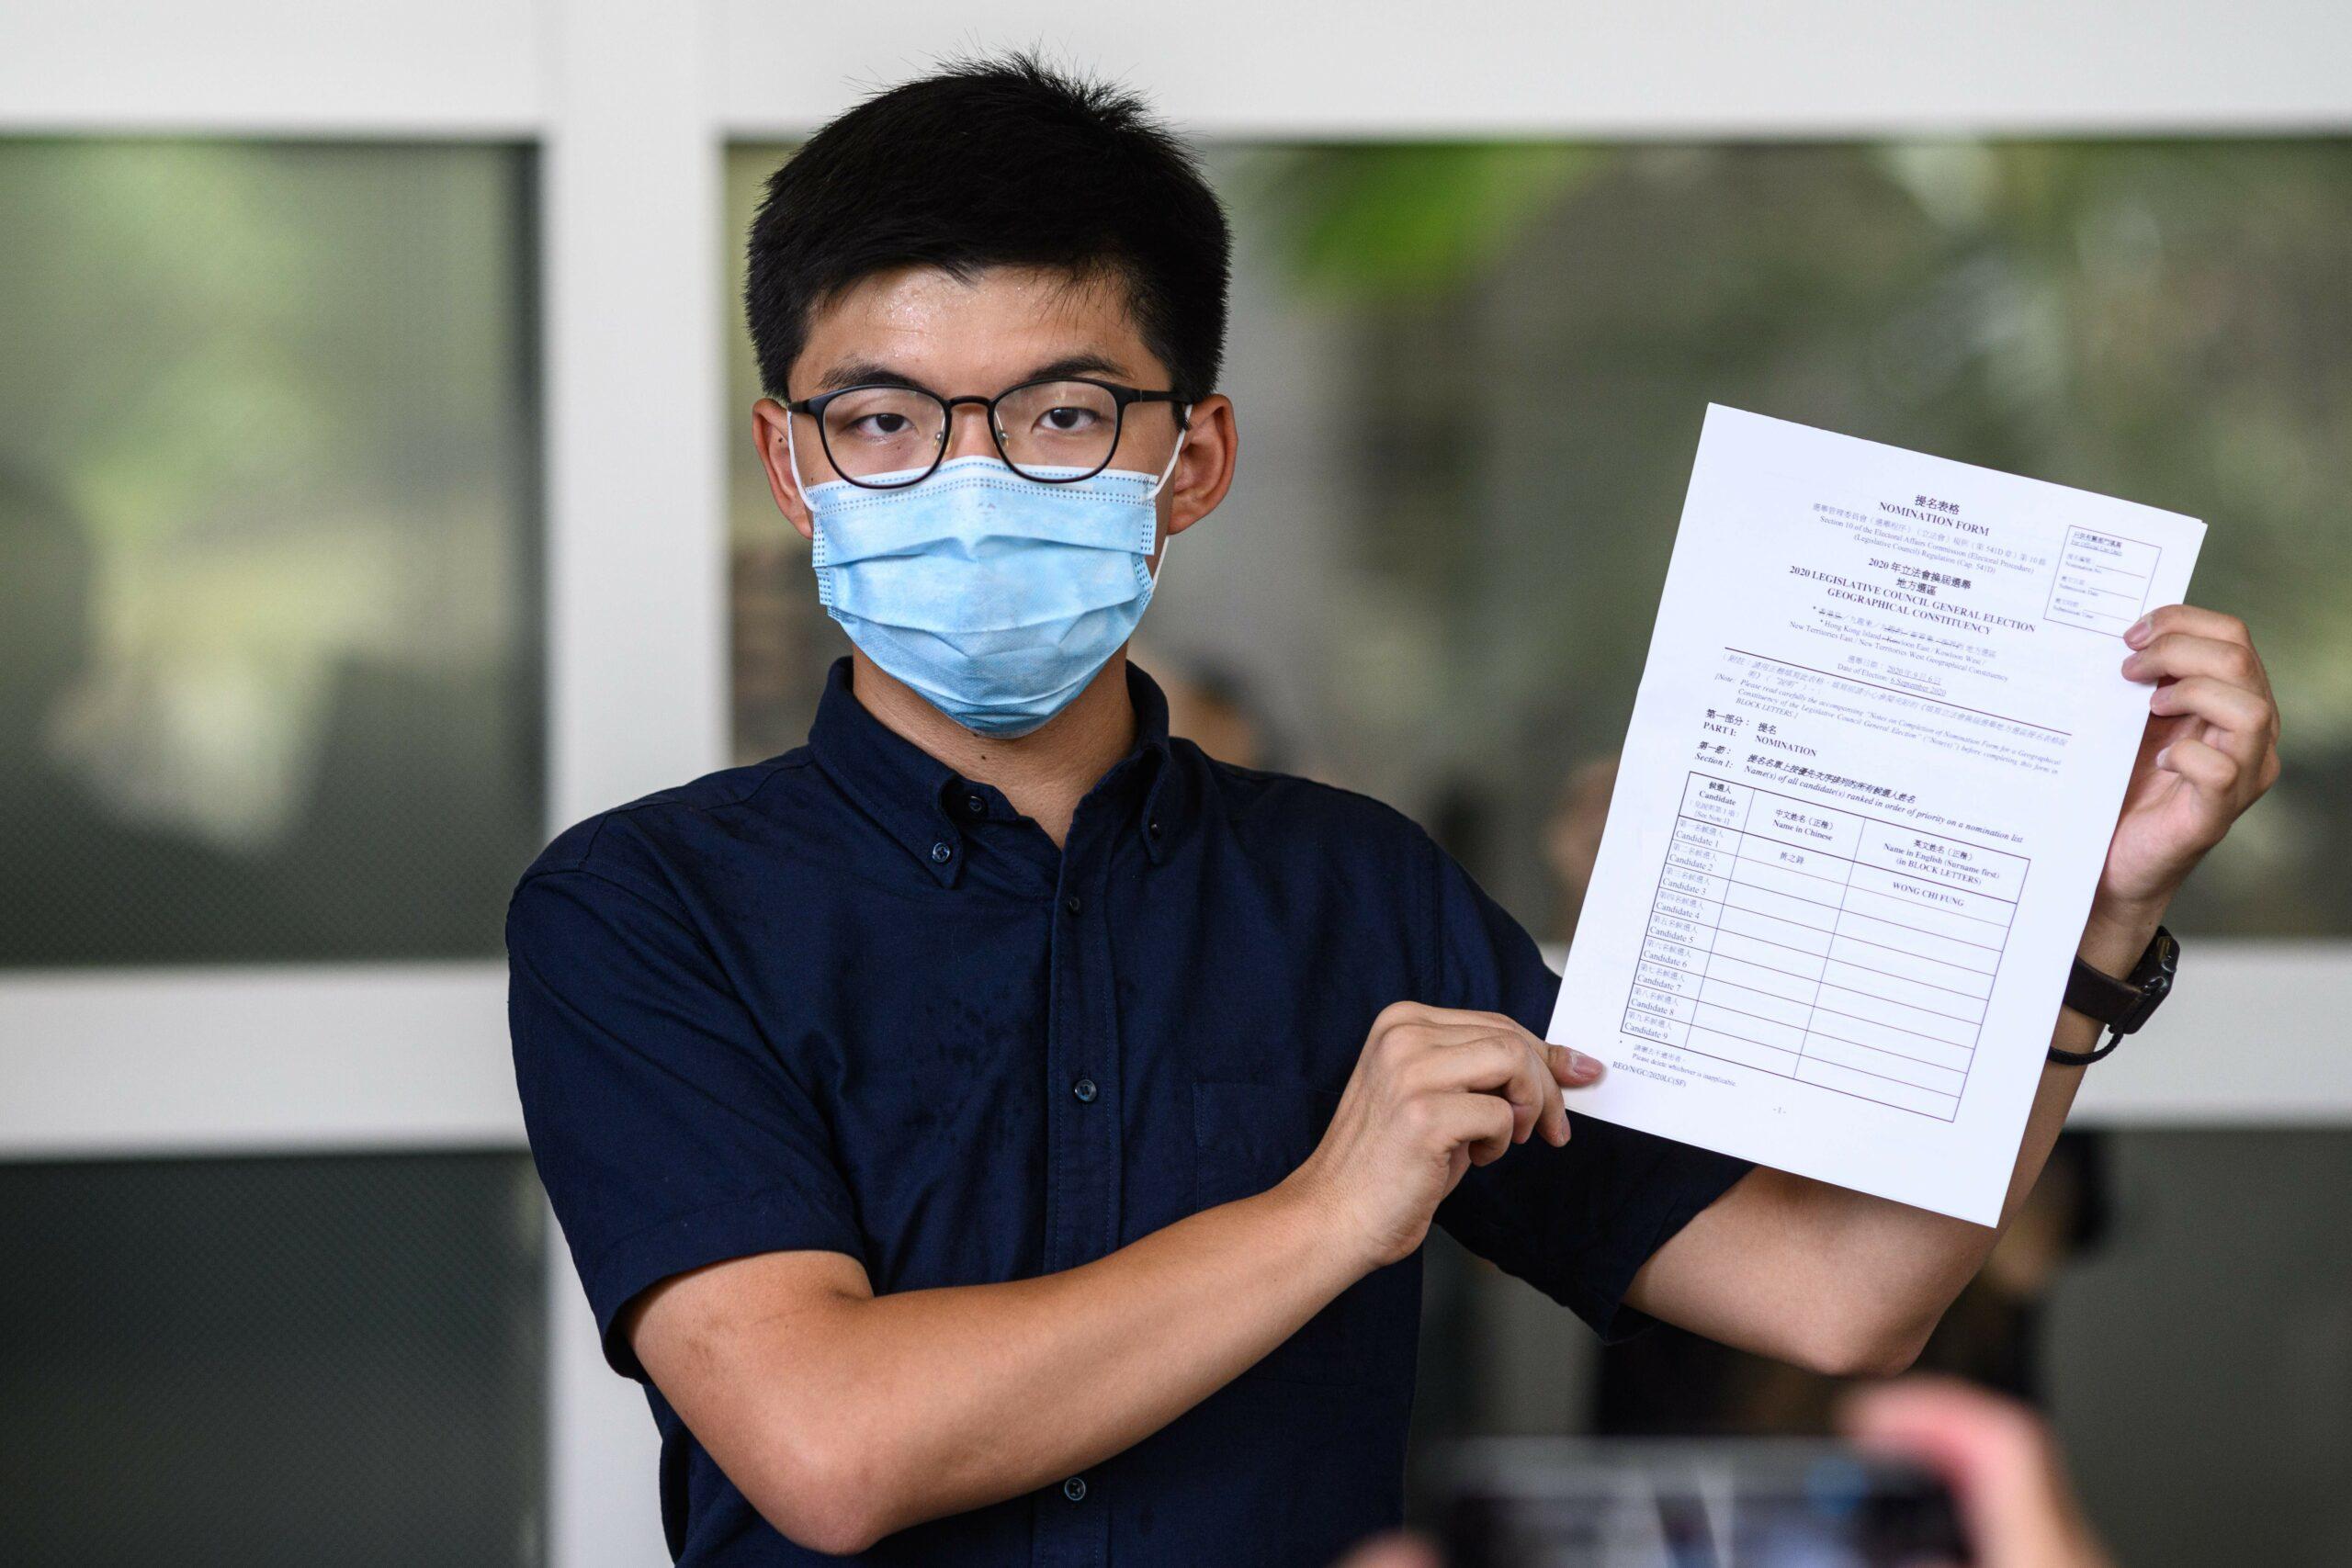 Critics slam Hong Kong move to bar professional-democracy candidates from election